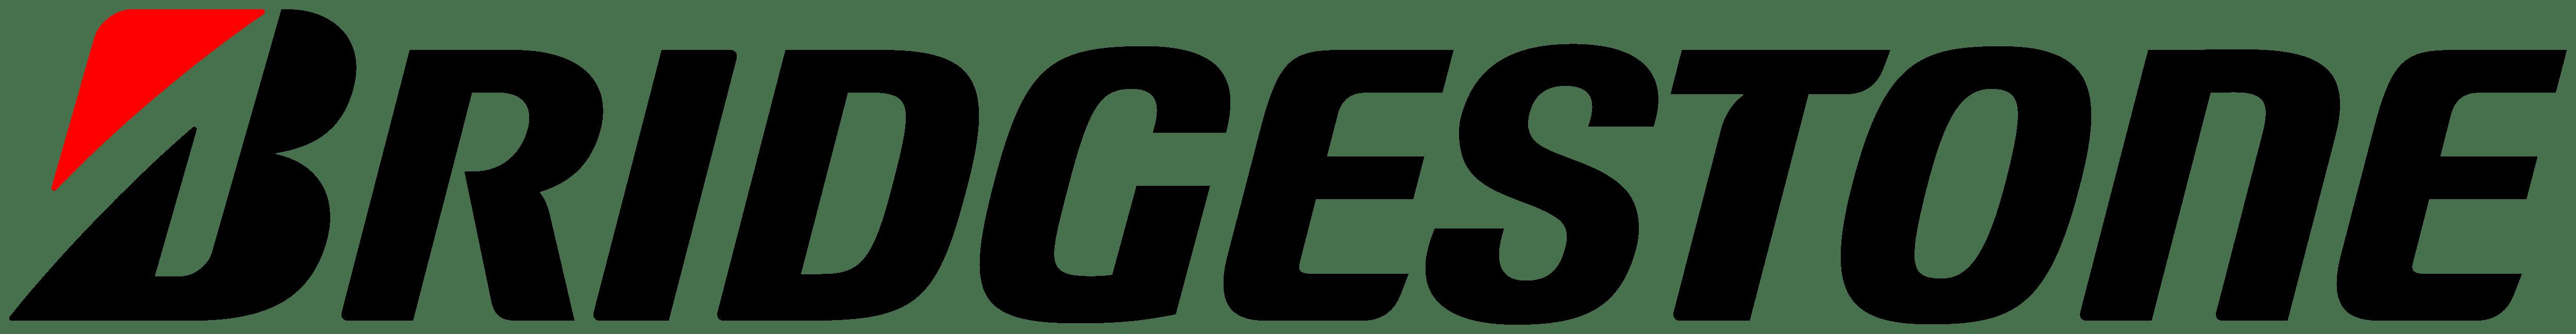 bridgestone tyre logo